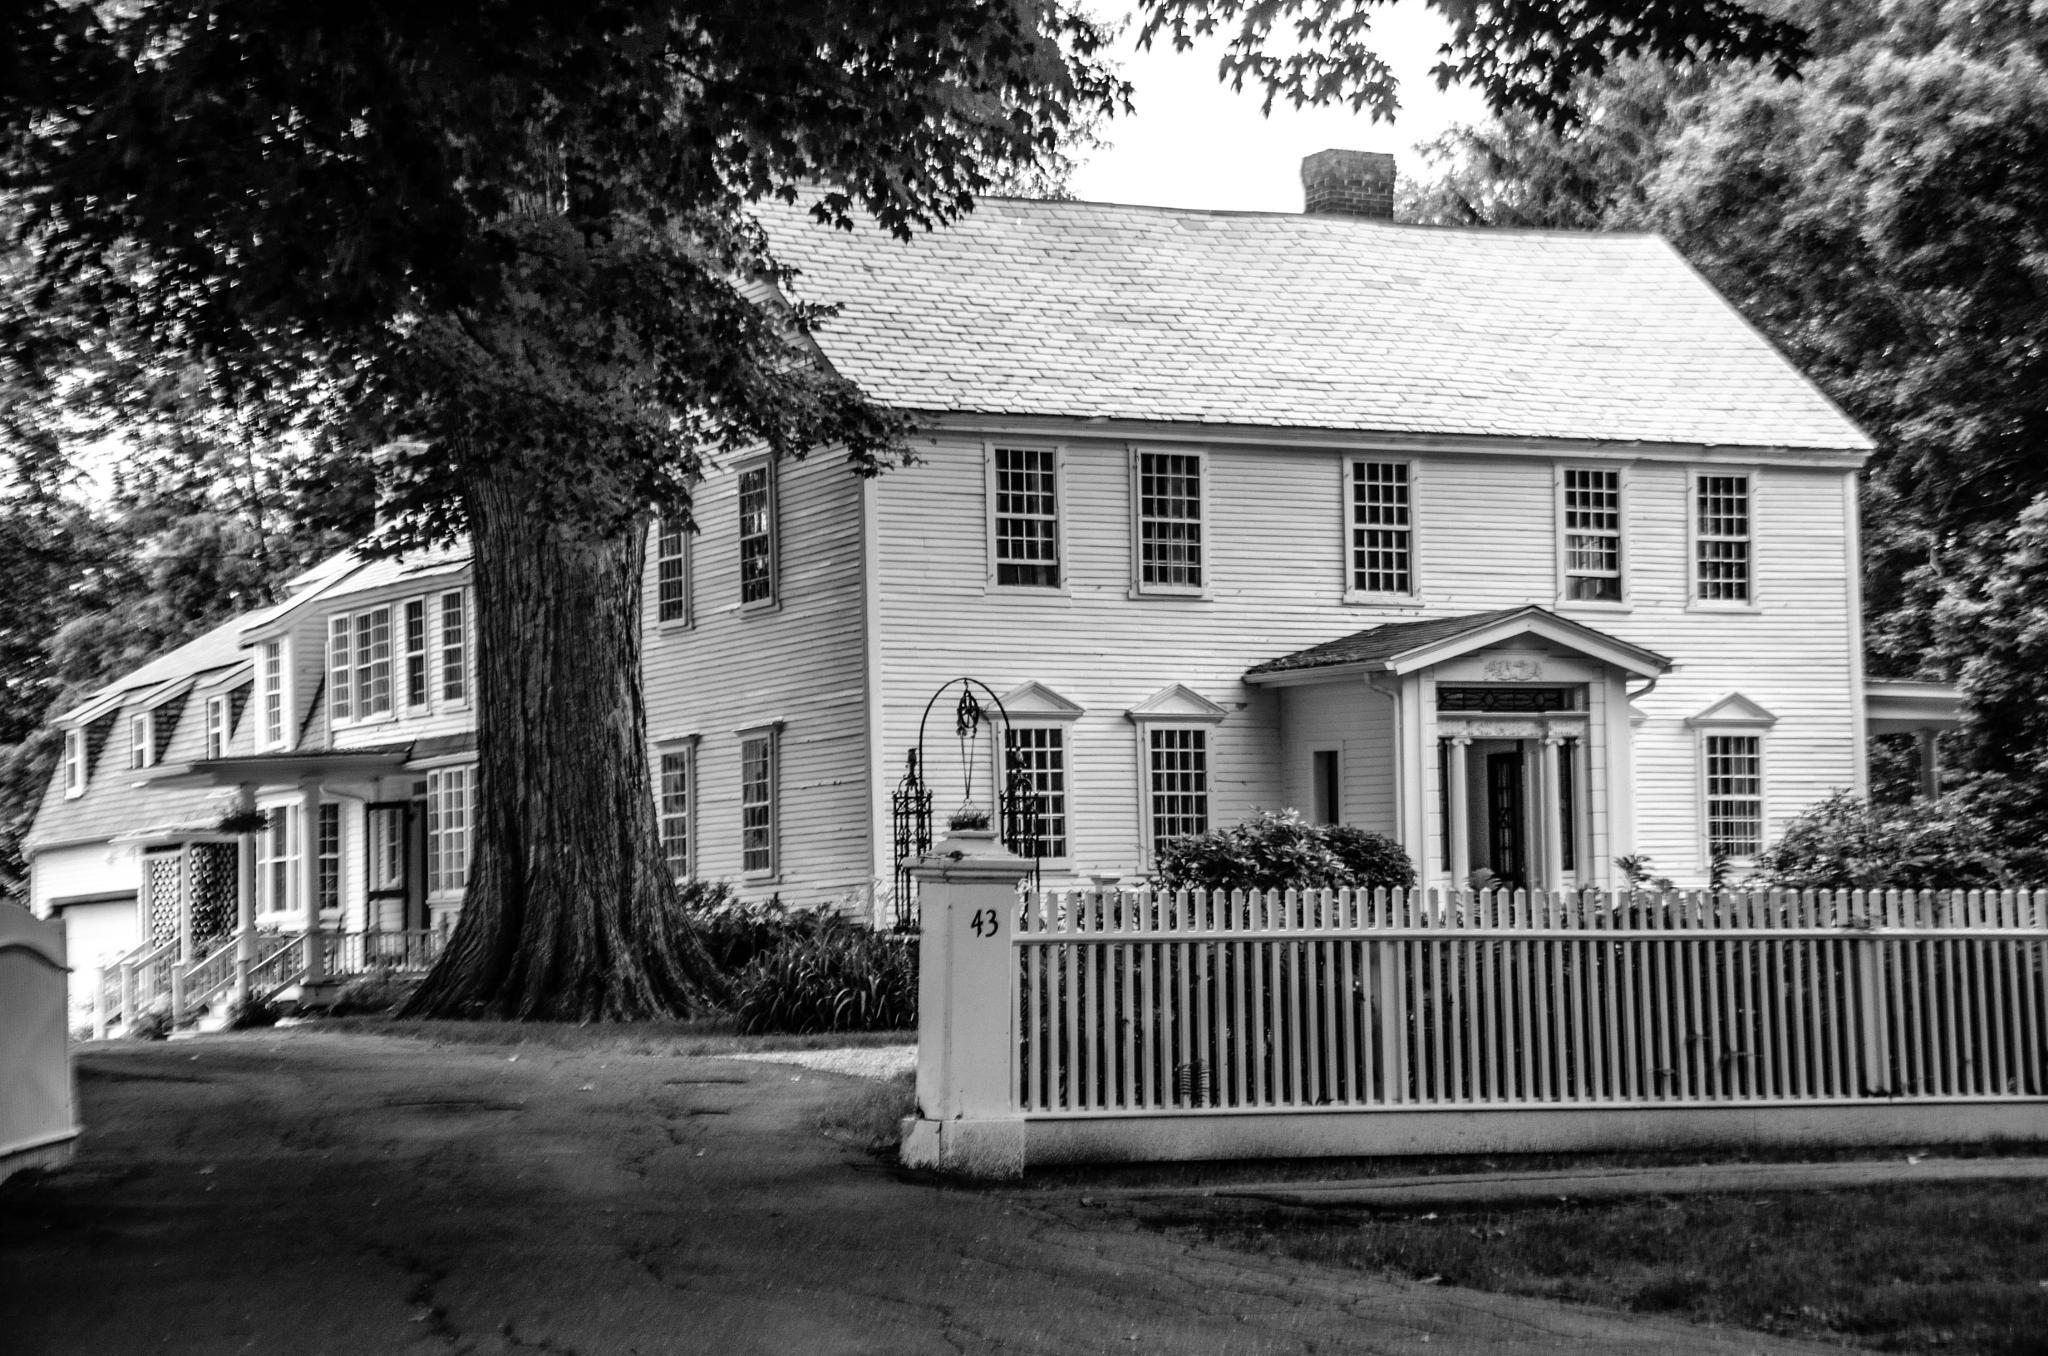 Massachusetts Architecture by davidpinter